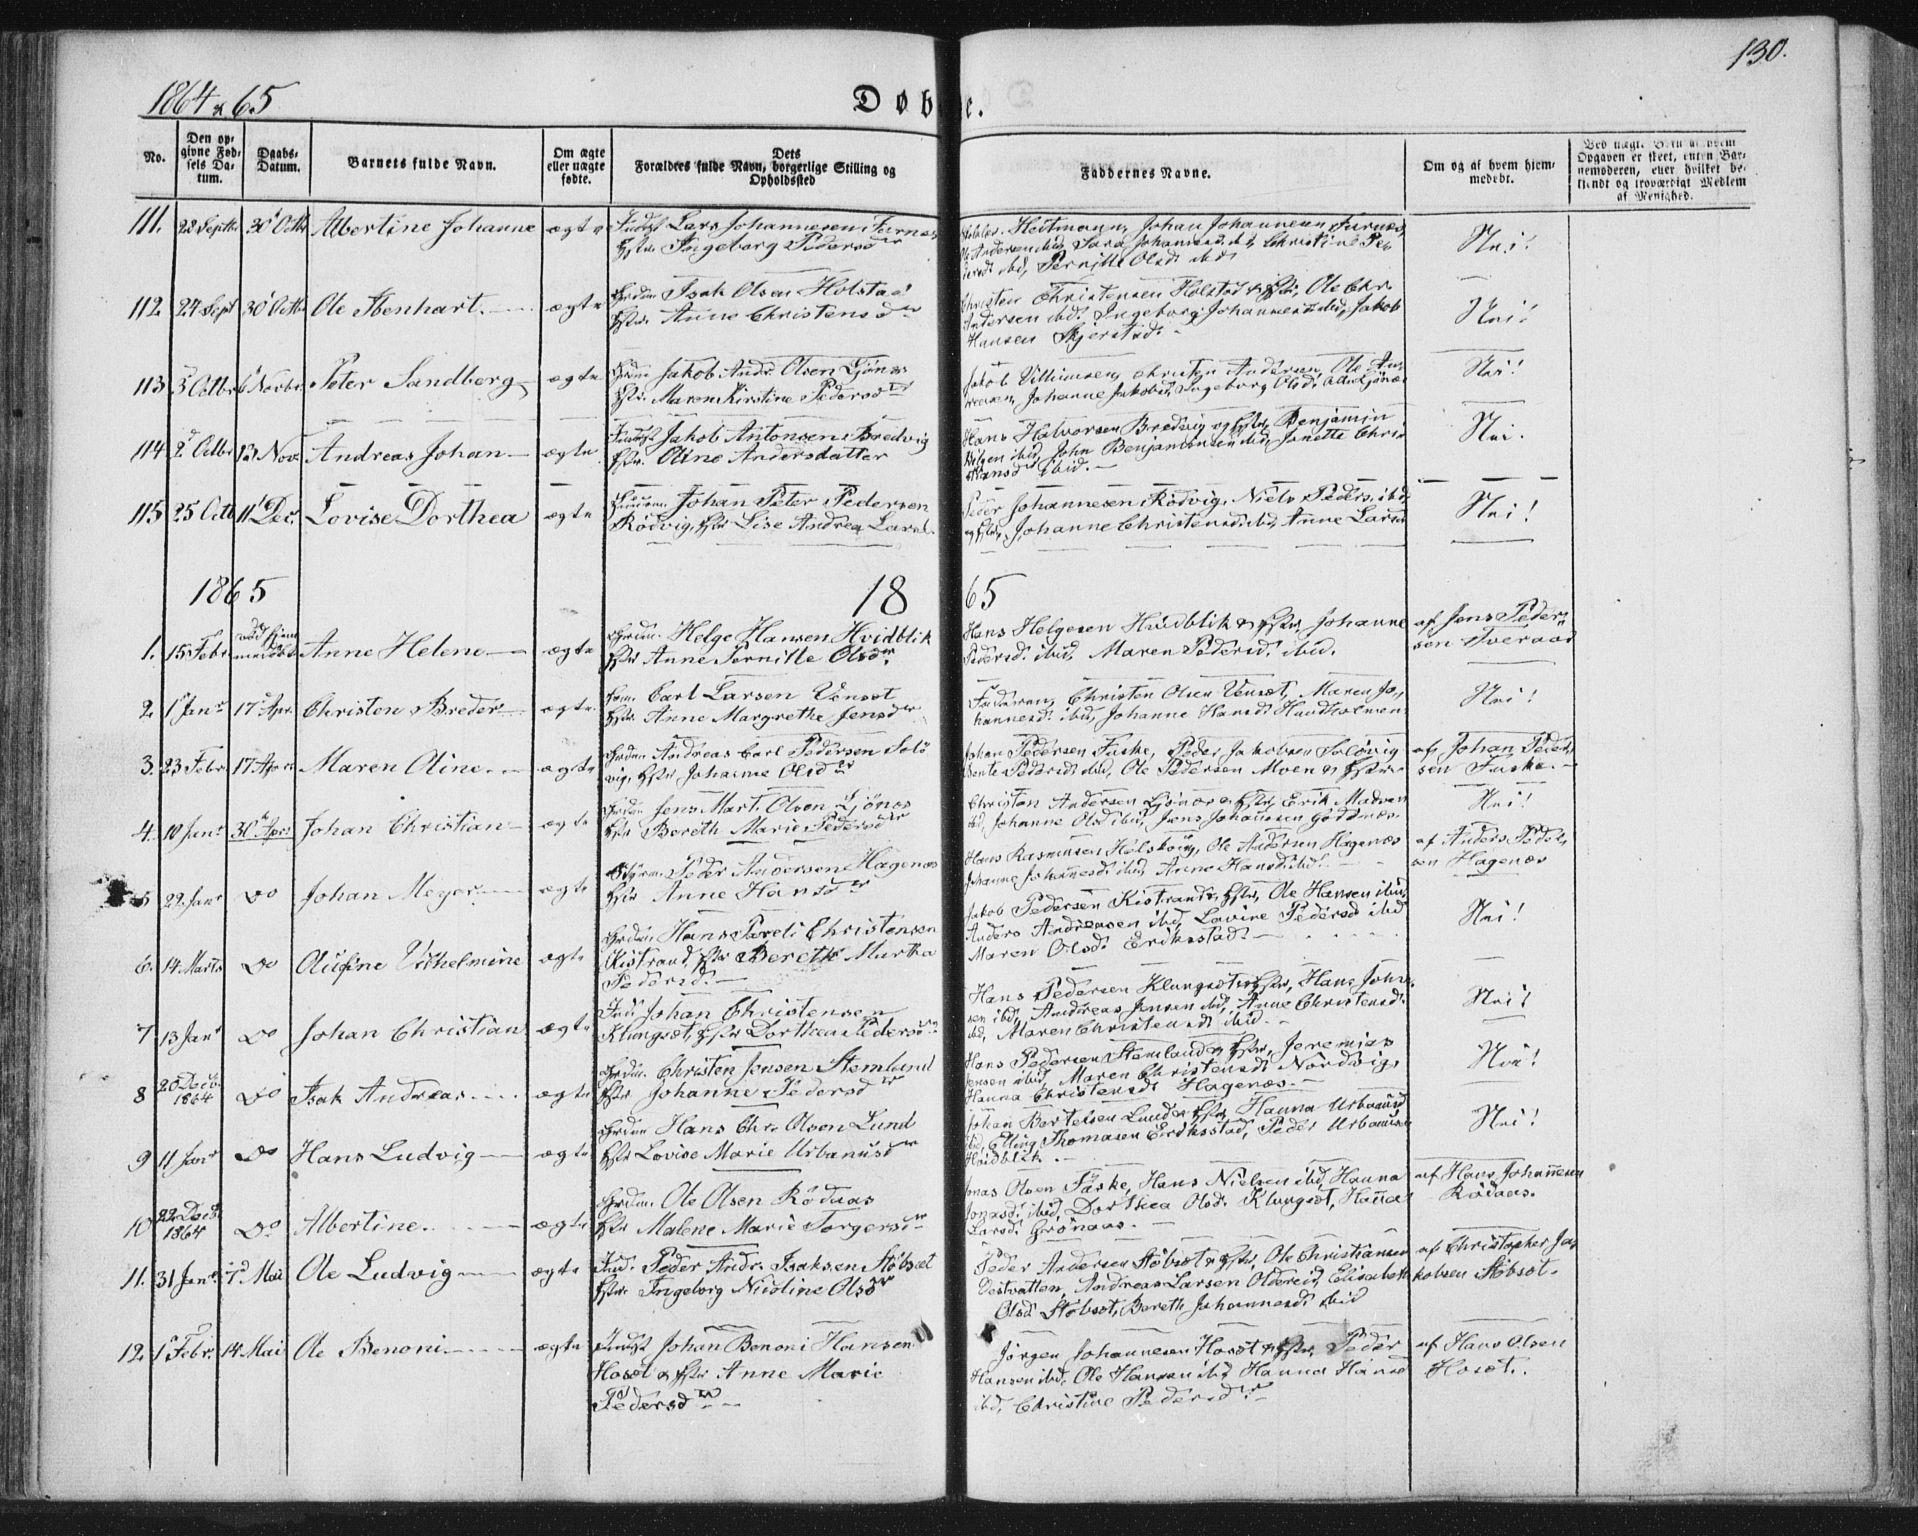 SAT, Ministerialprotokoller, klokkerbøker og fødselsregistre - Nordland, 852/L0738: Ministerialbok nr. 852A08, 1849-1865, s. 130